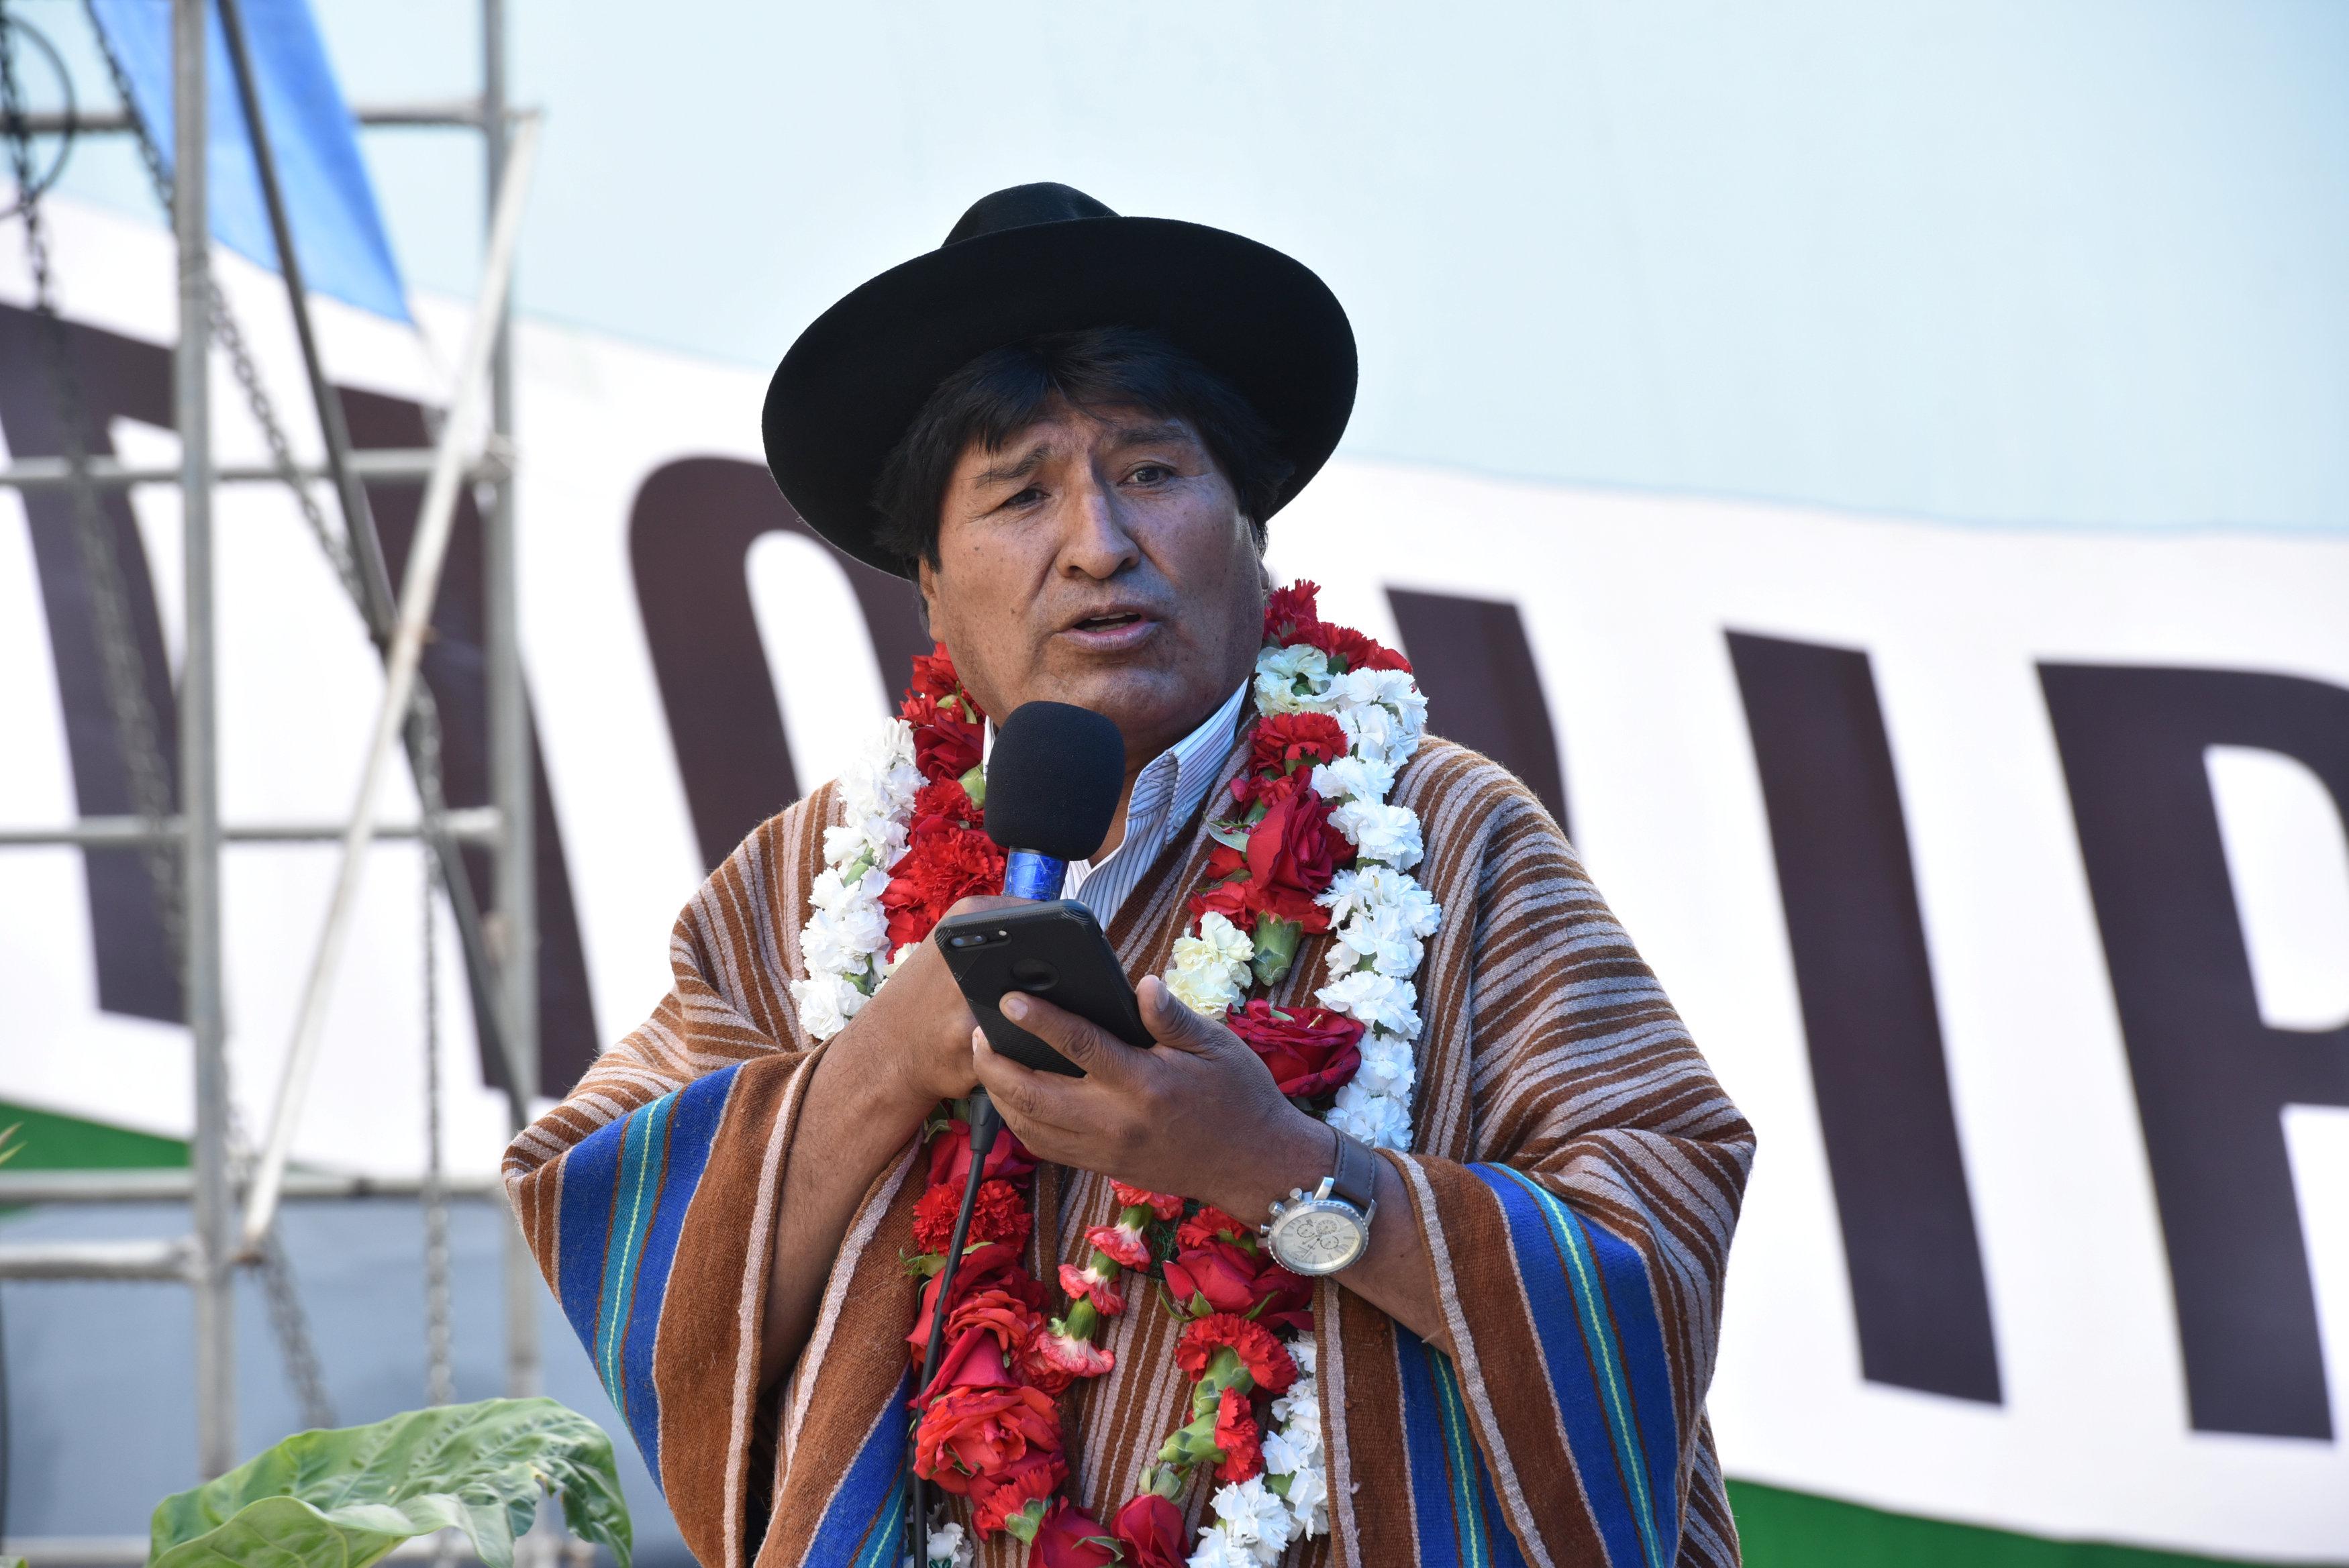 Bolvia's president authorised to run for fourth term